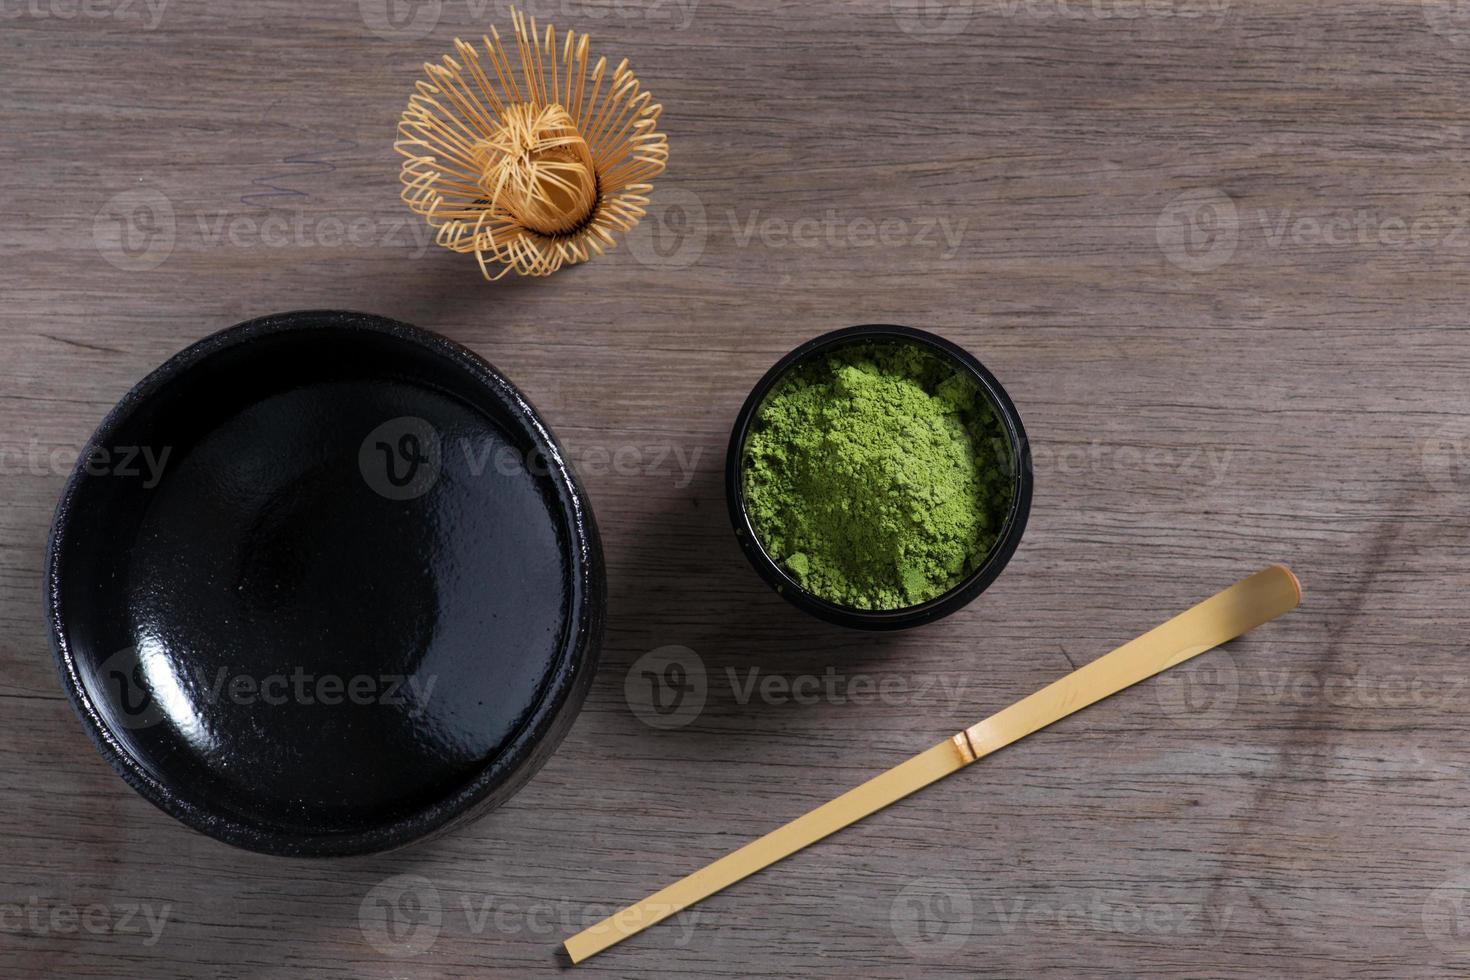 Ceremonia del té japonesa en banco de madera. foto